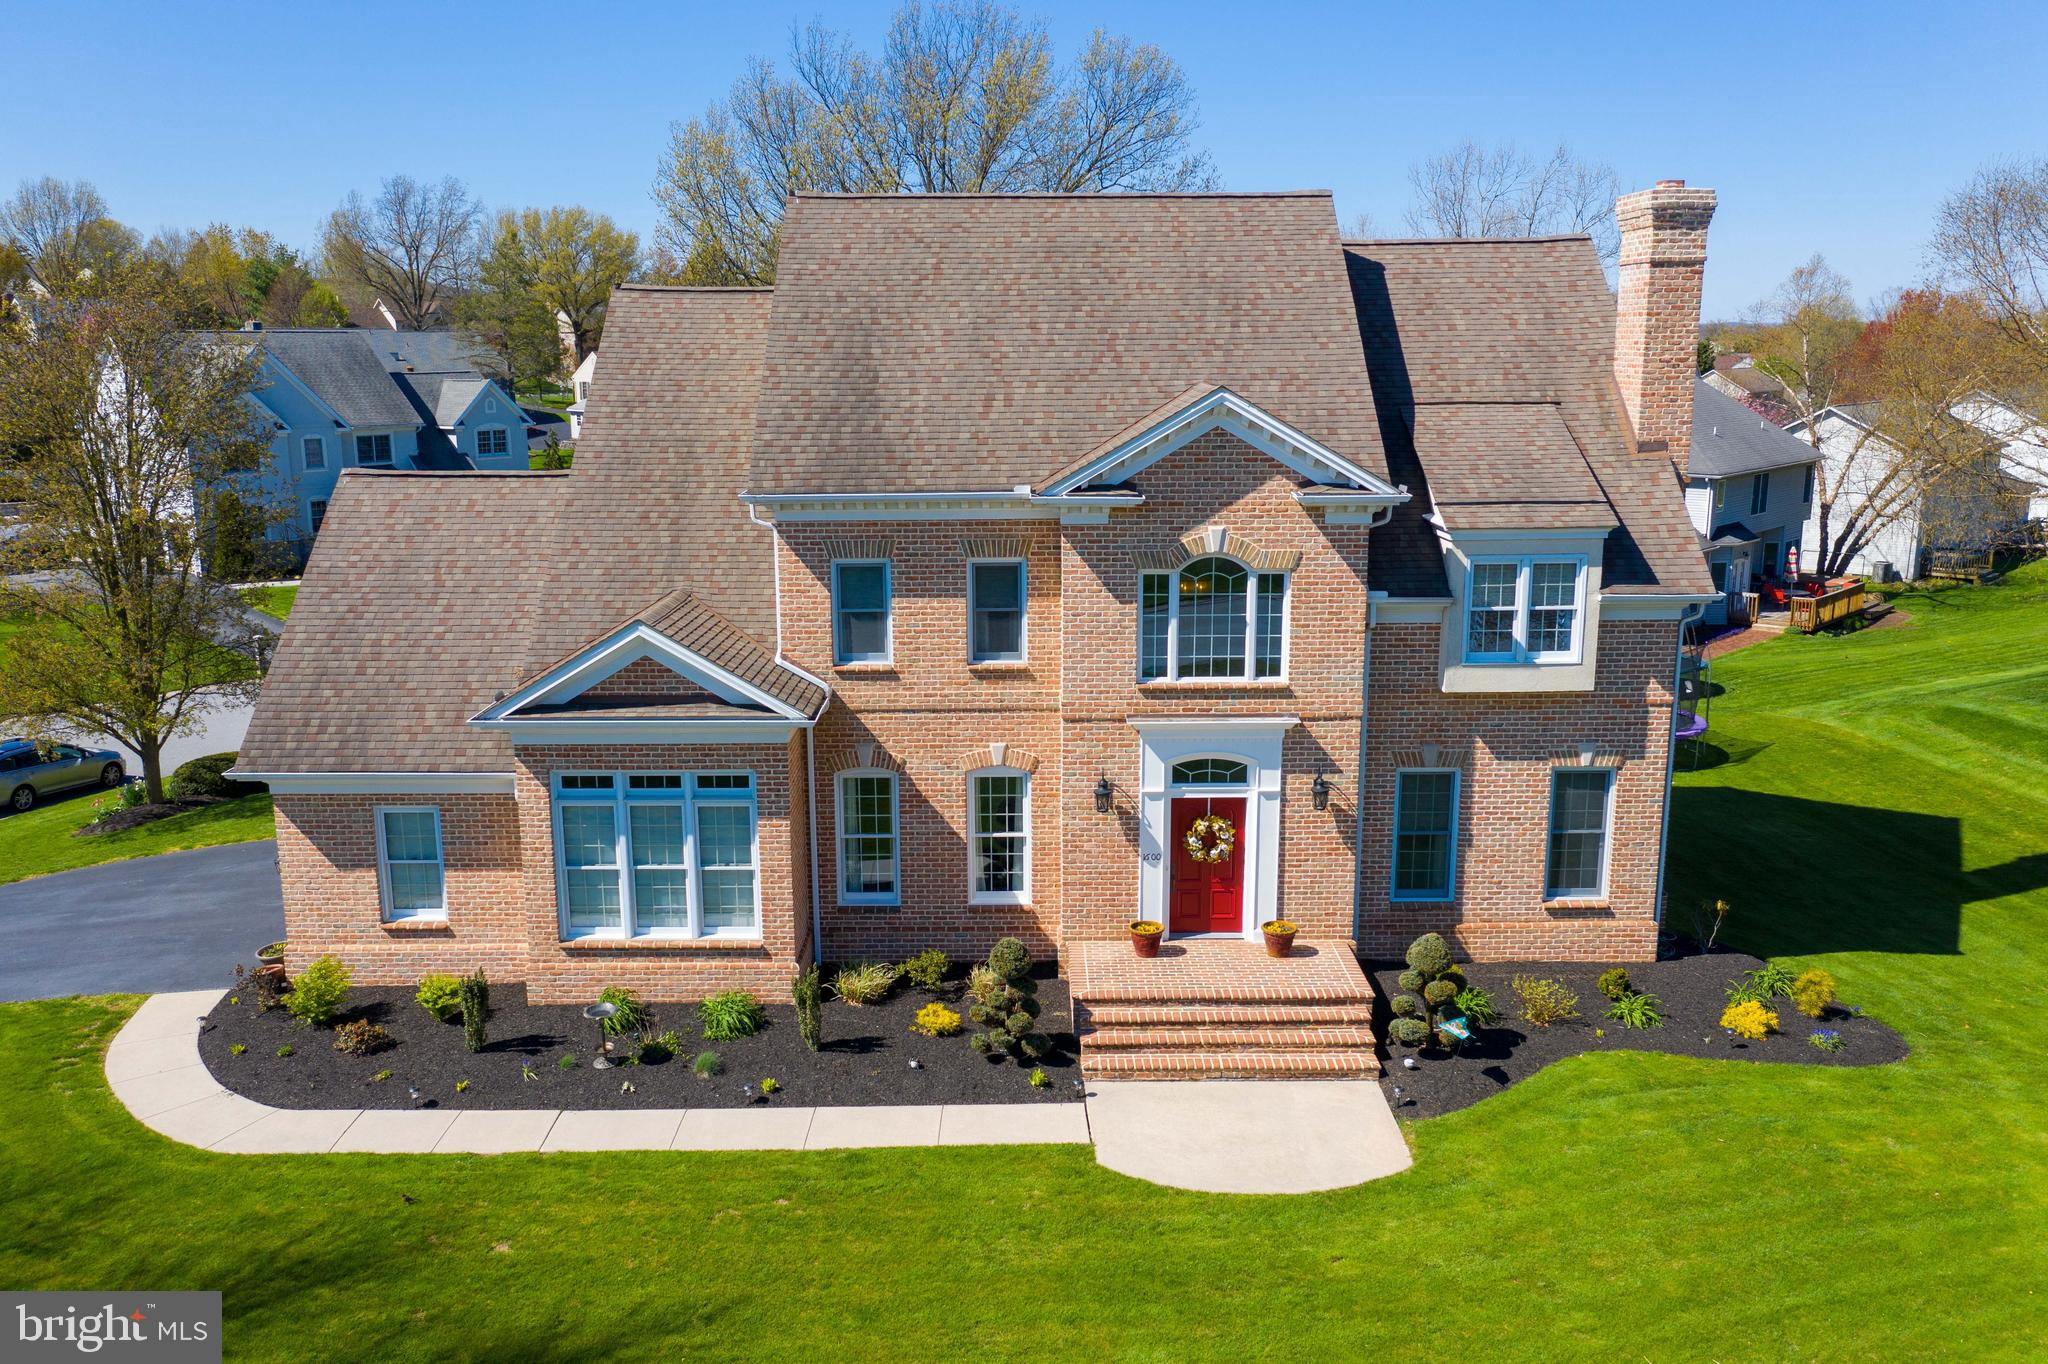 1600 Detwiler Drive, York, PA 17404